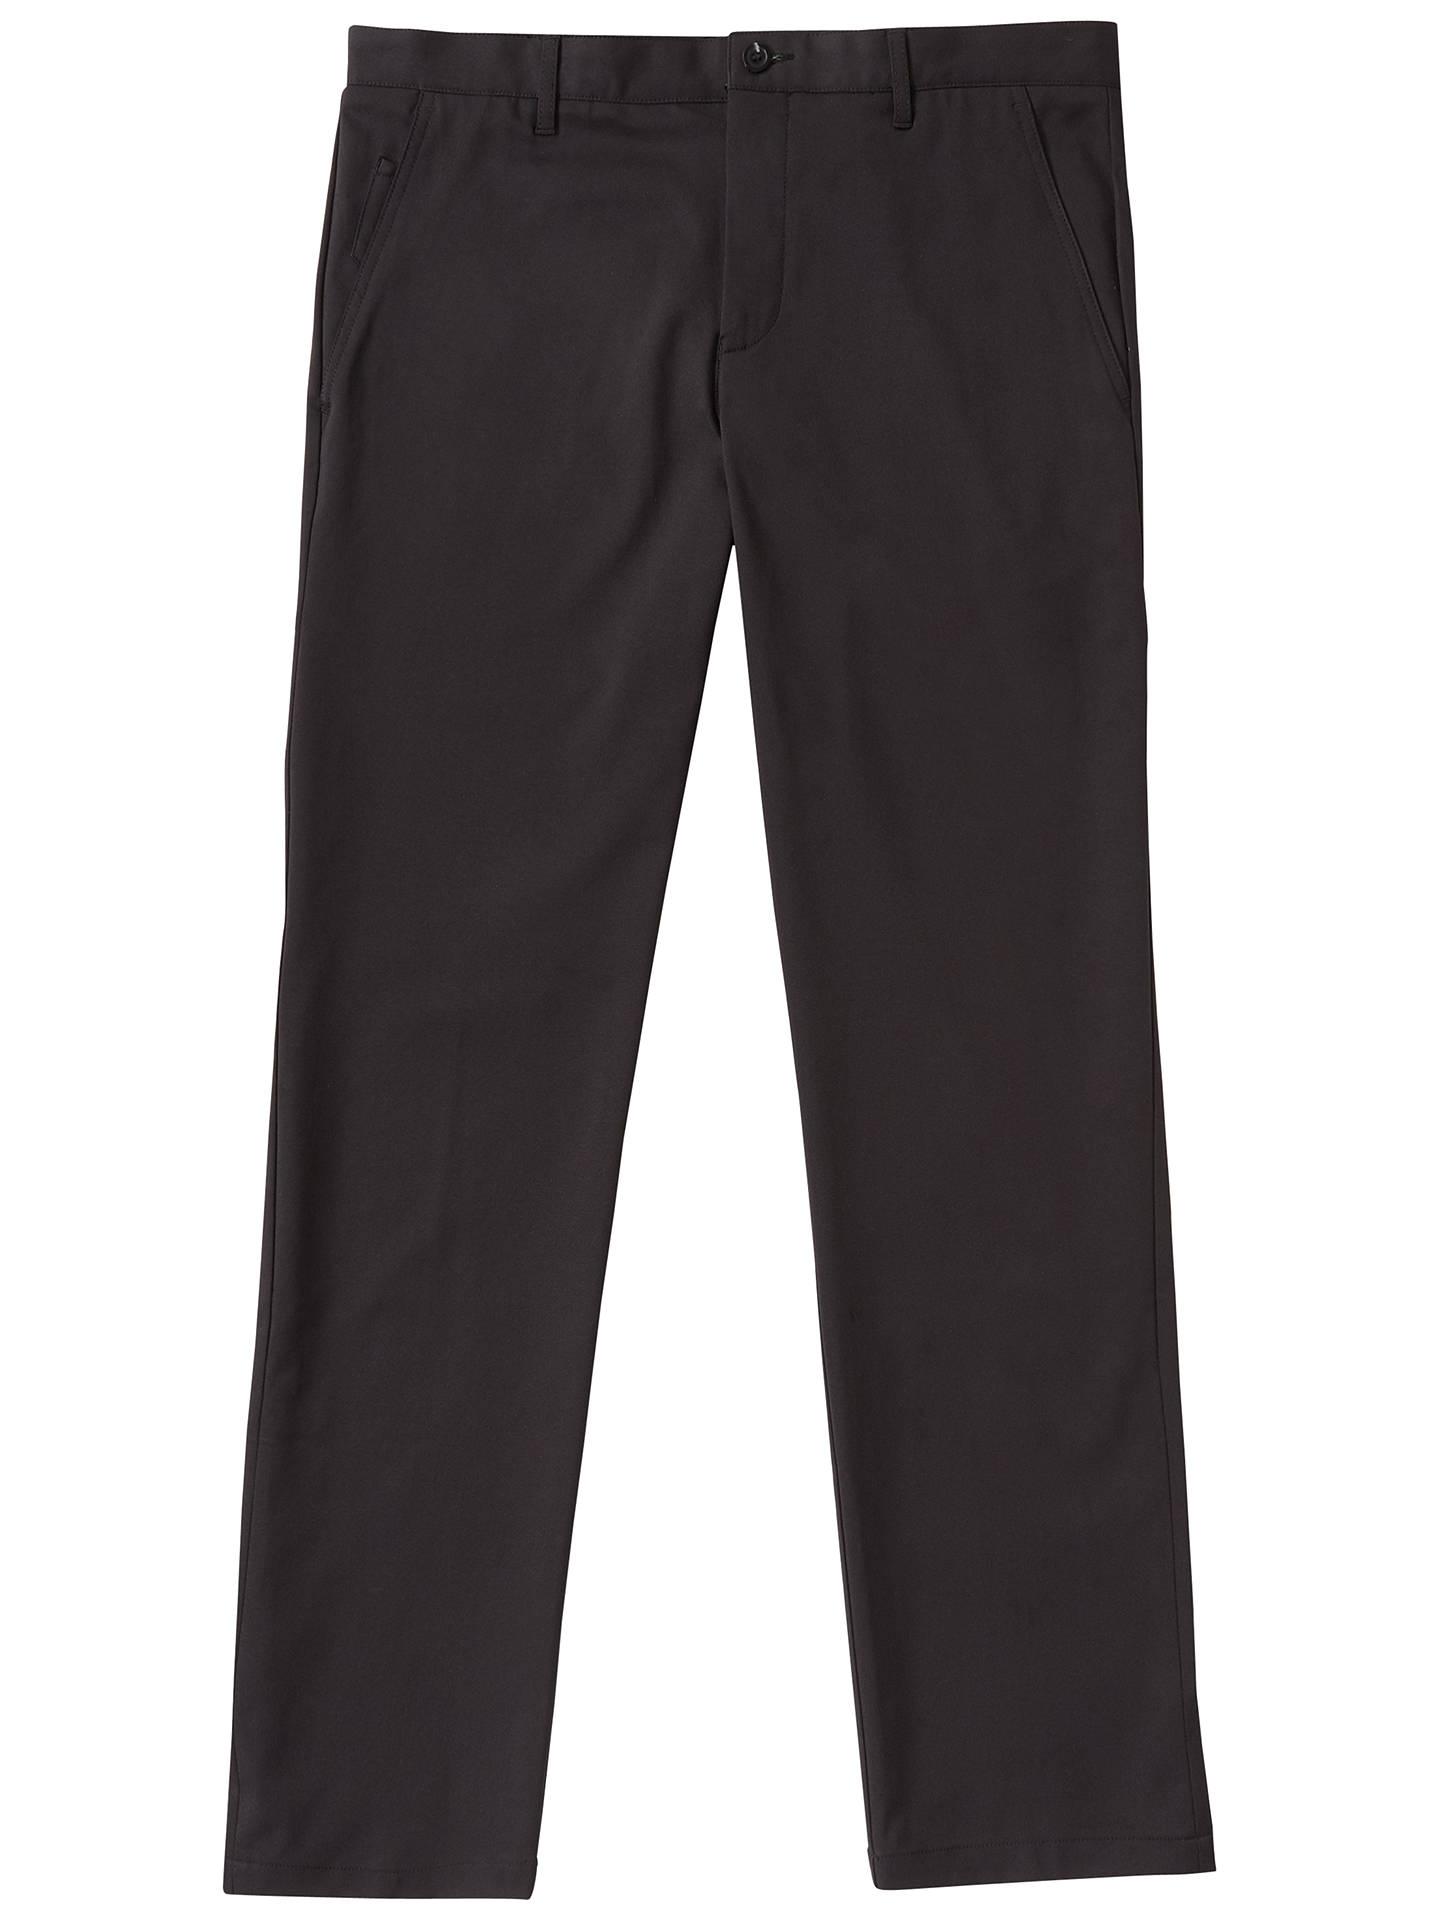 9c111eaef Buy BOSS Green Pro Golf Hakan Slim Fit Trousers, Black, 30R Online at  johnlewis ...